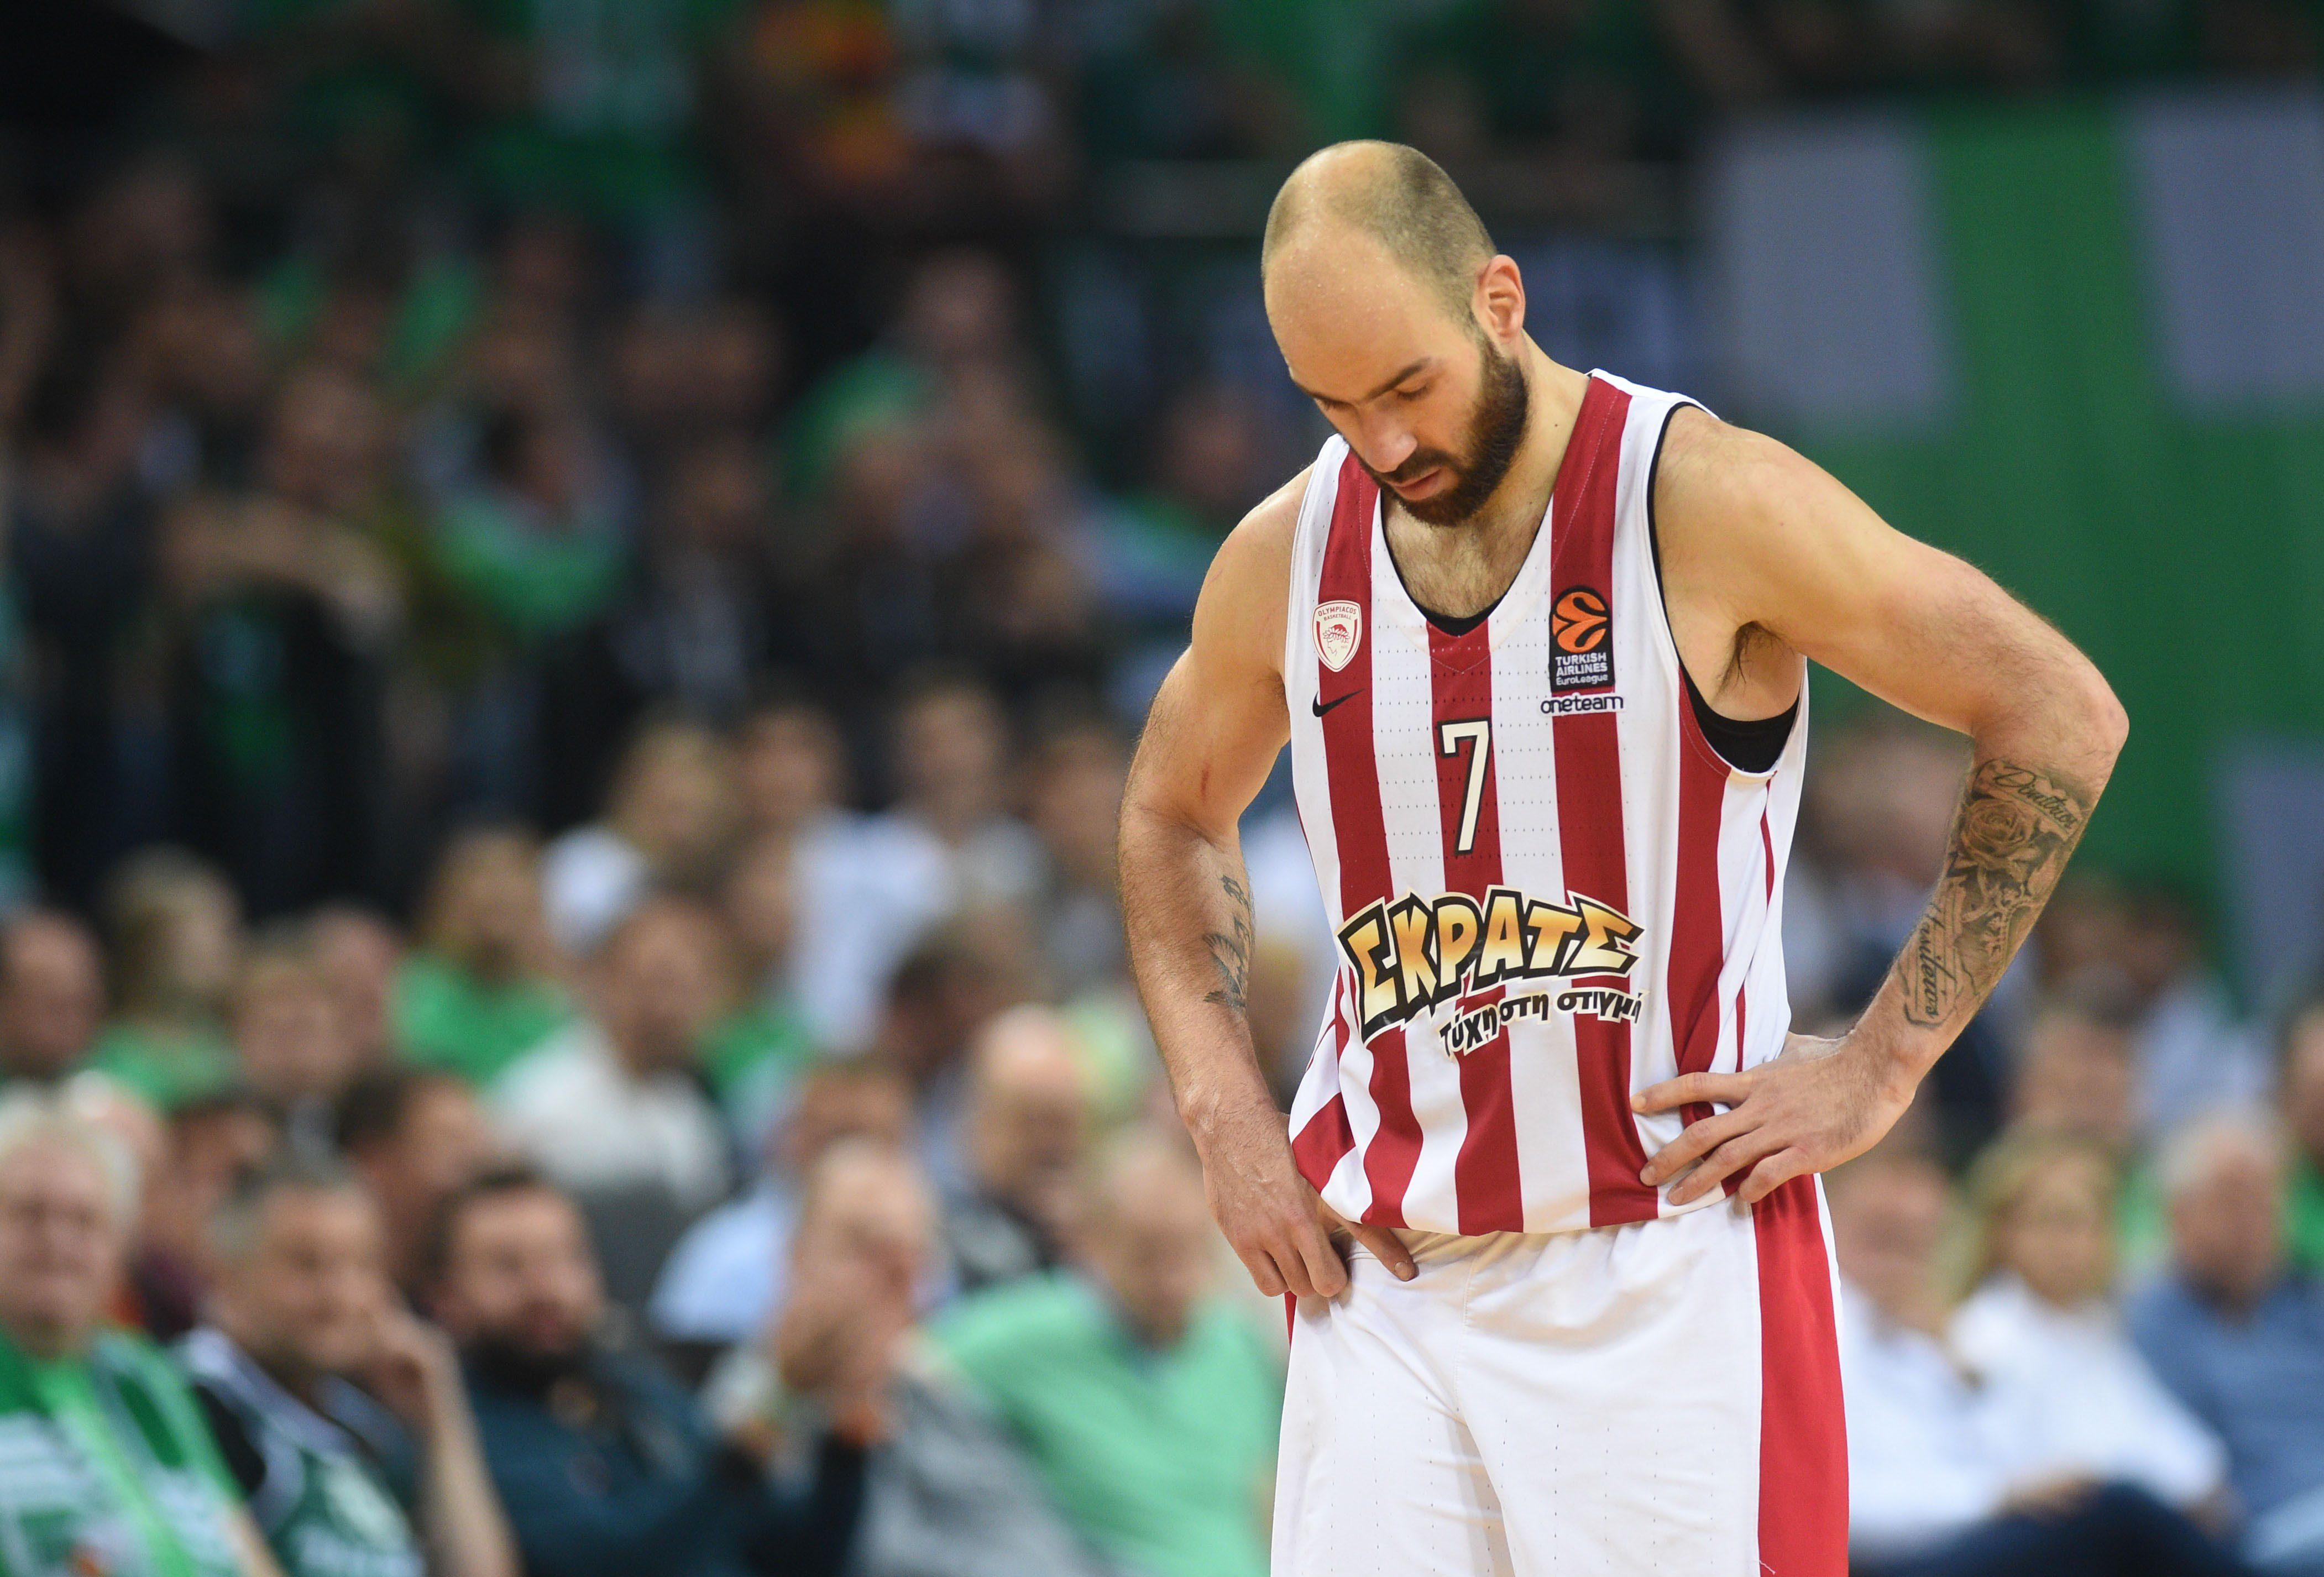 https://www.sportime.gr/wp-content/uploads/2018/04/spanoulis-6.jpg